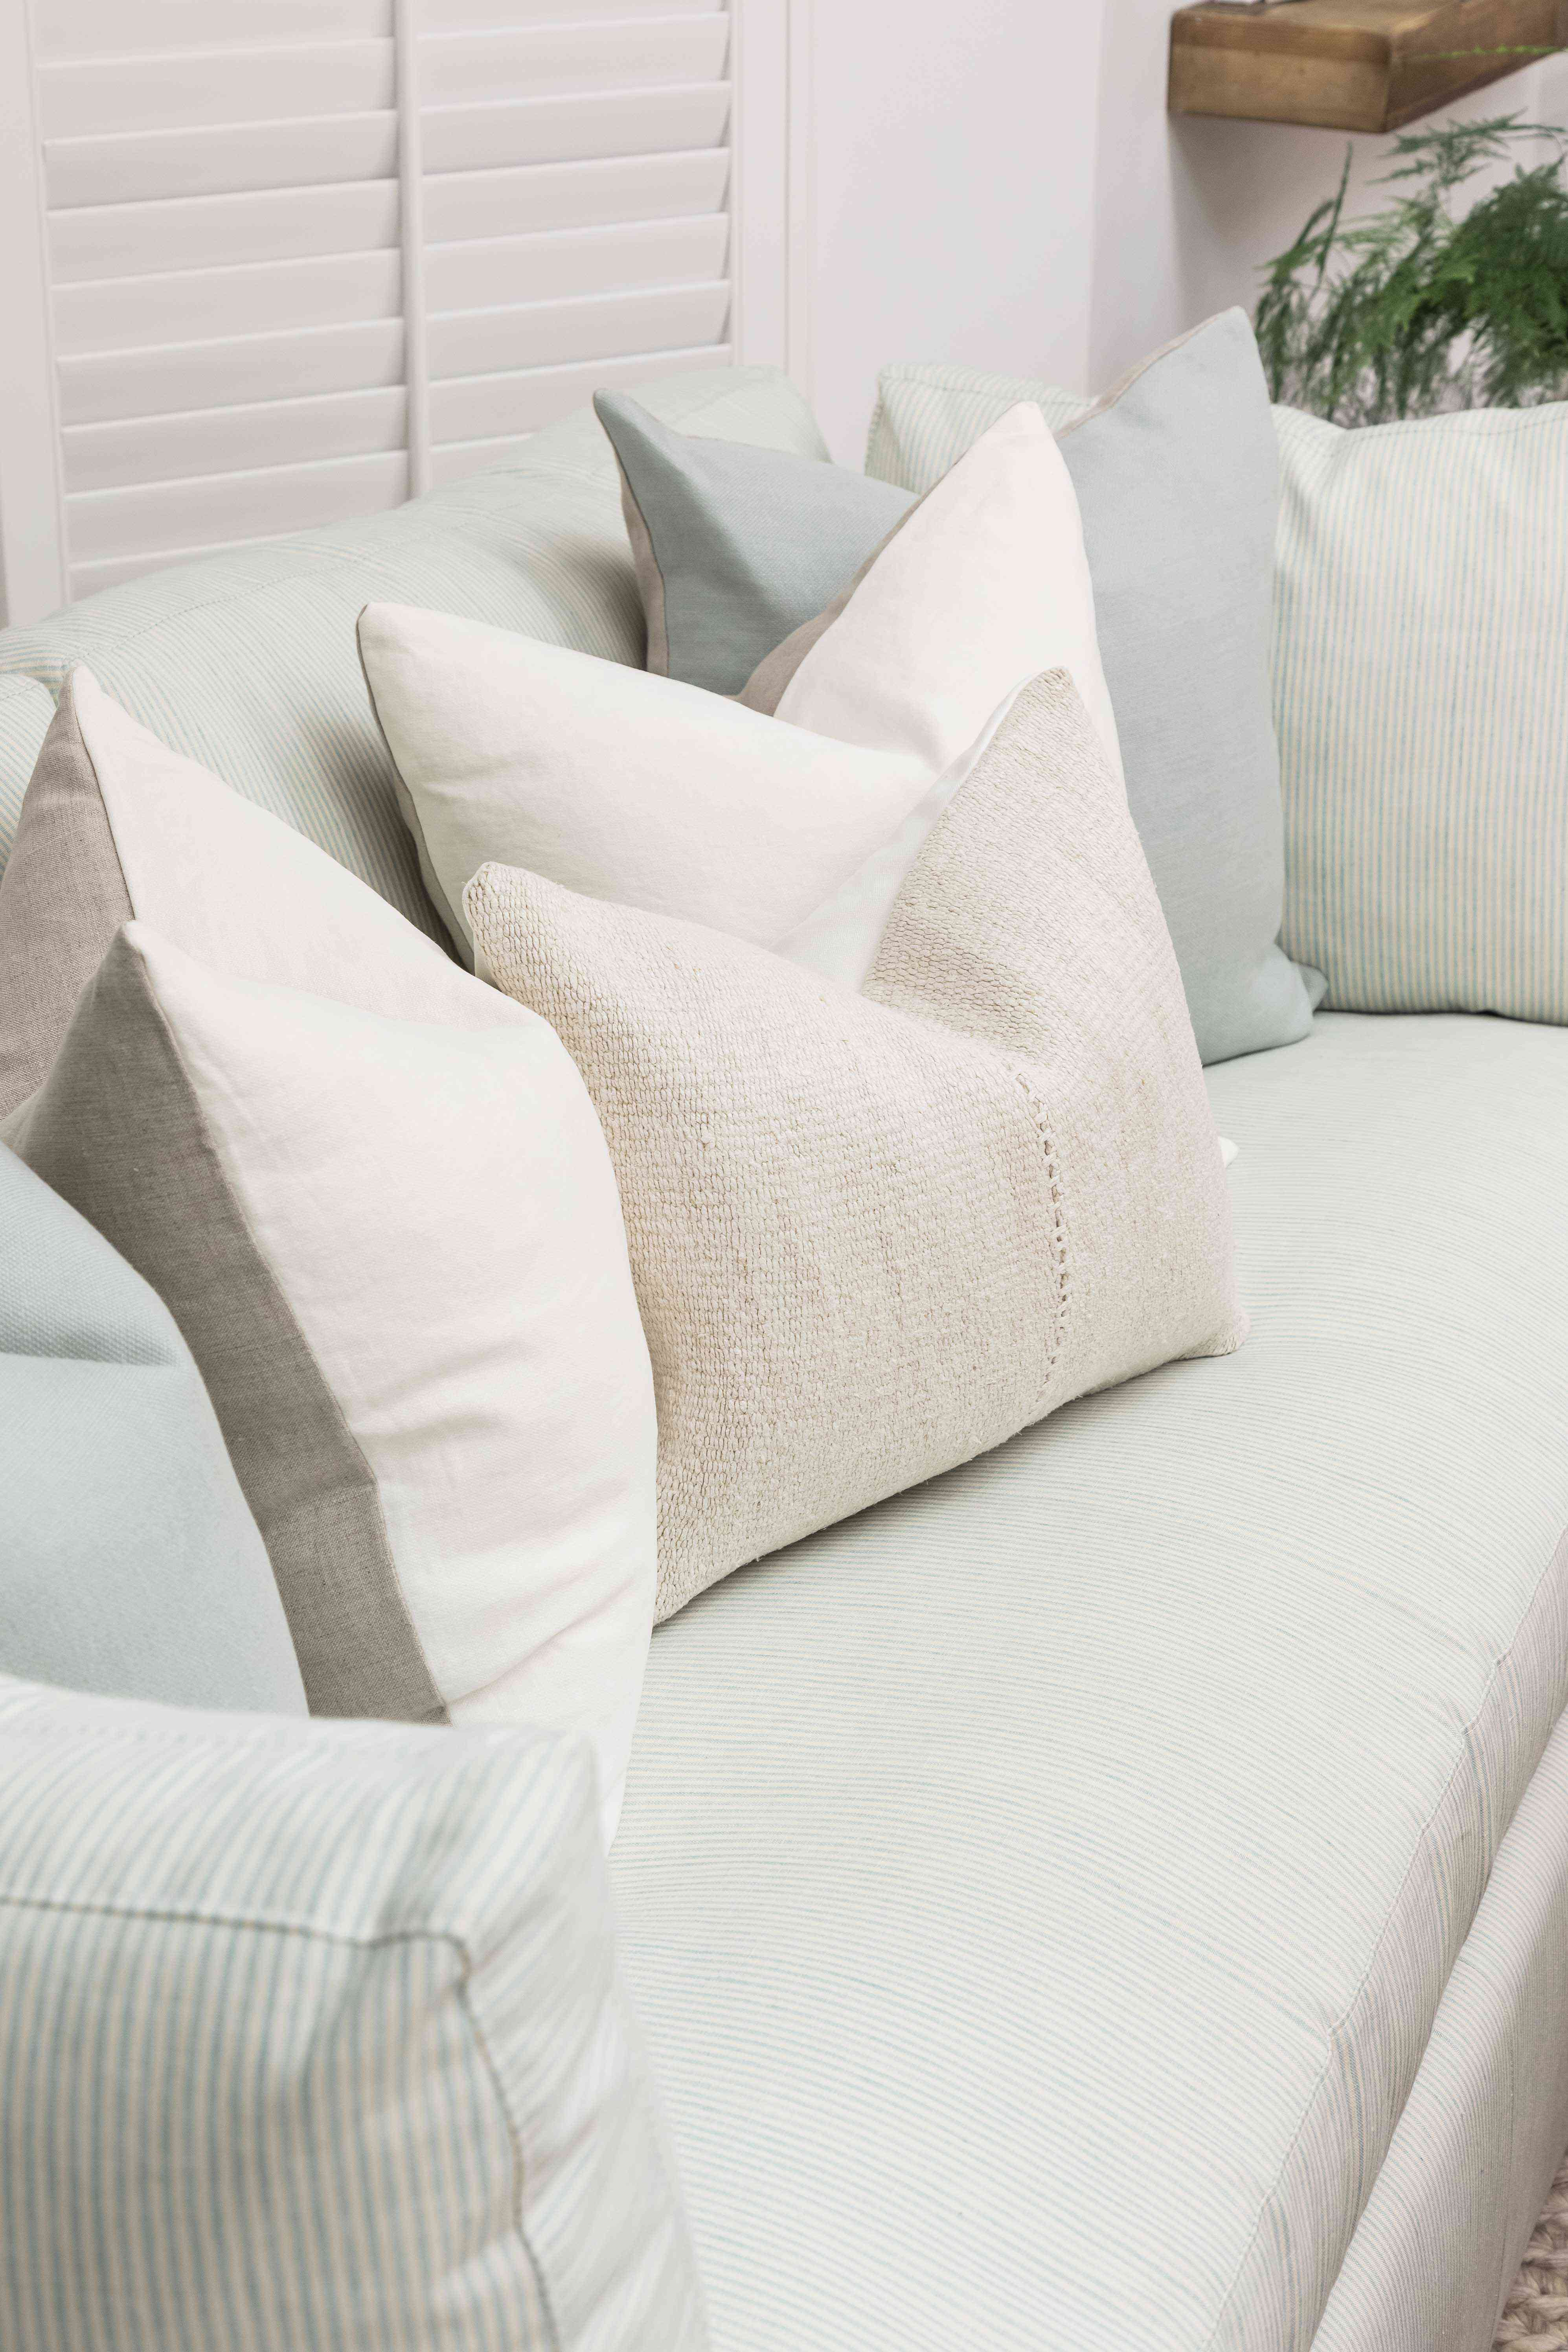 Close-up of neutral sofa.